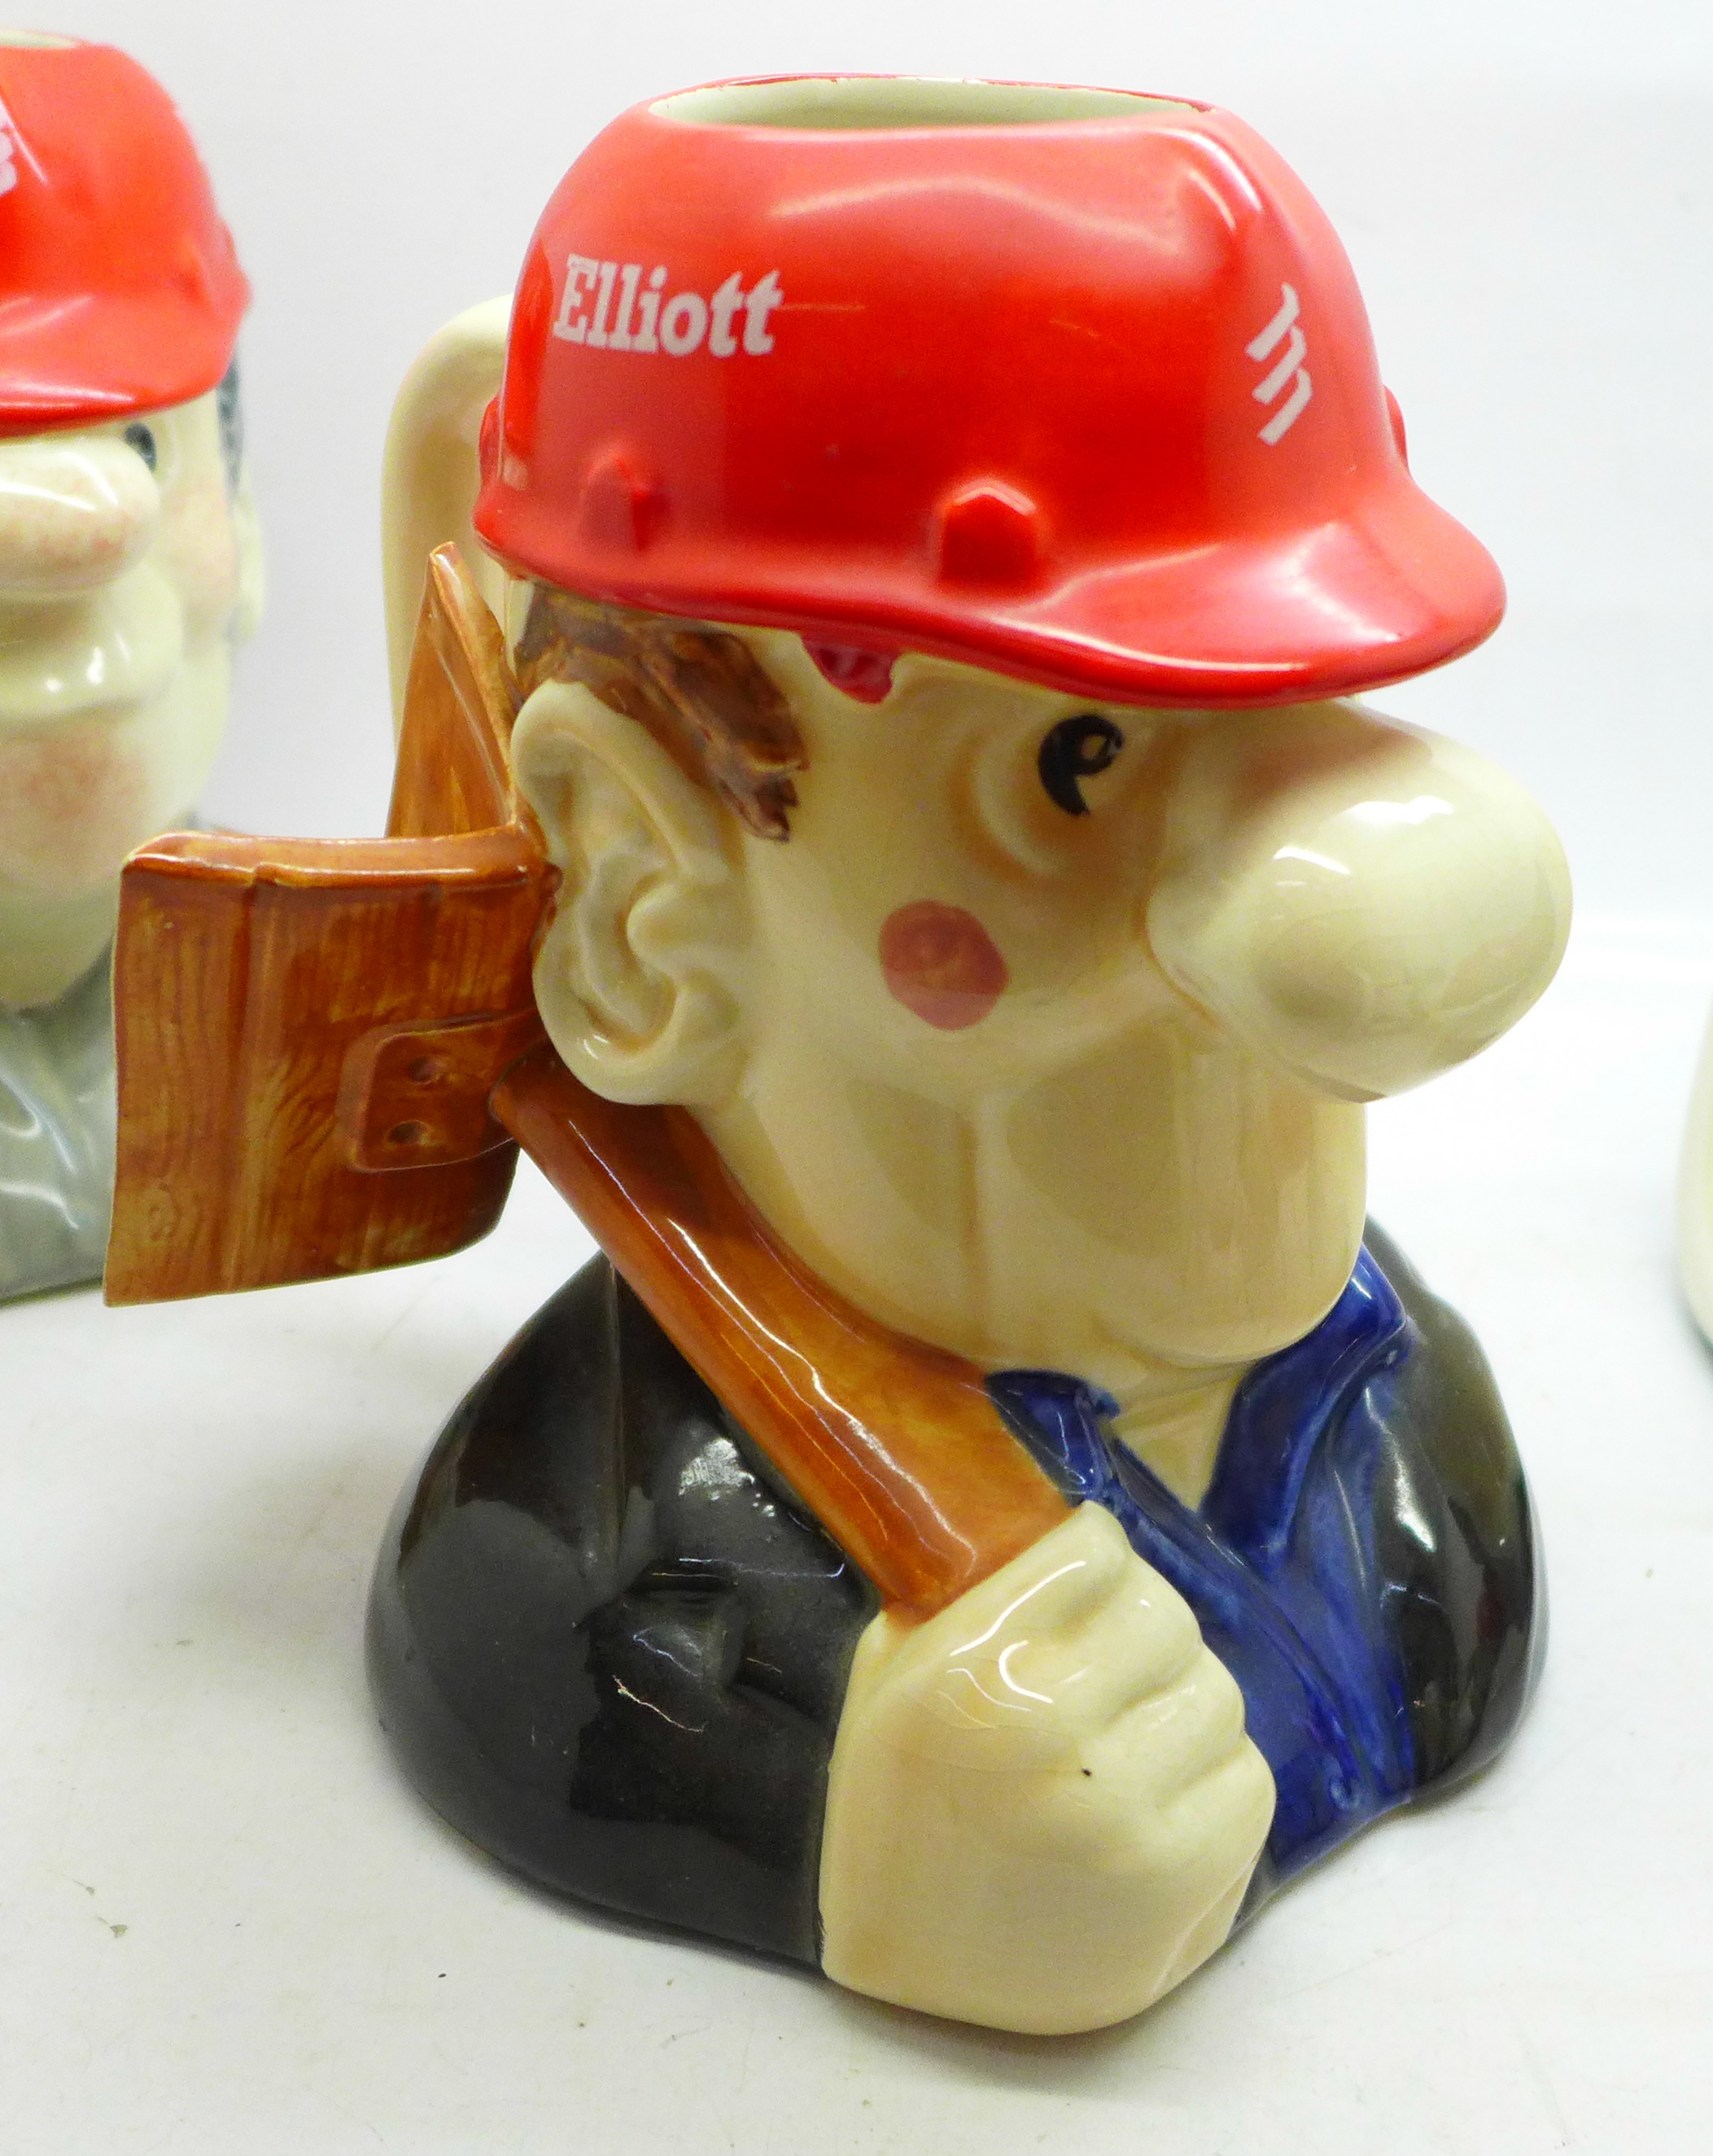 Four Elliott Toby jugs, 'The Builders' - Image 5 of 6